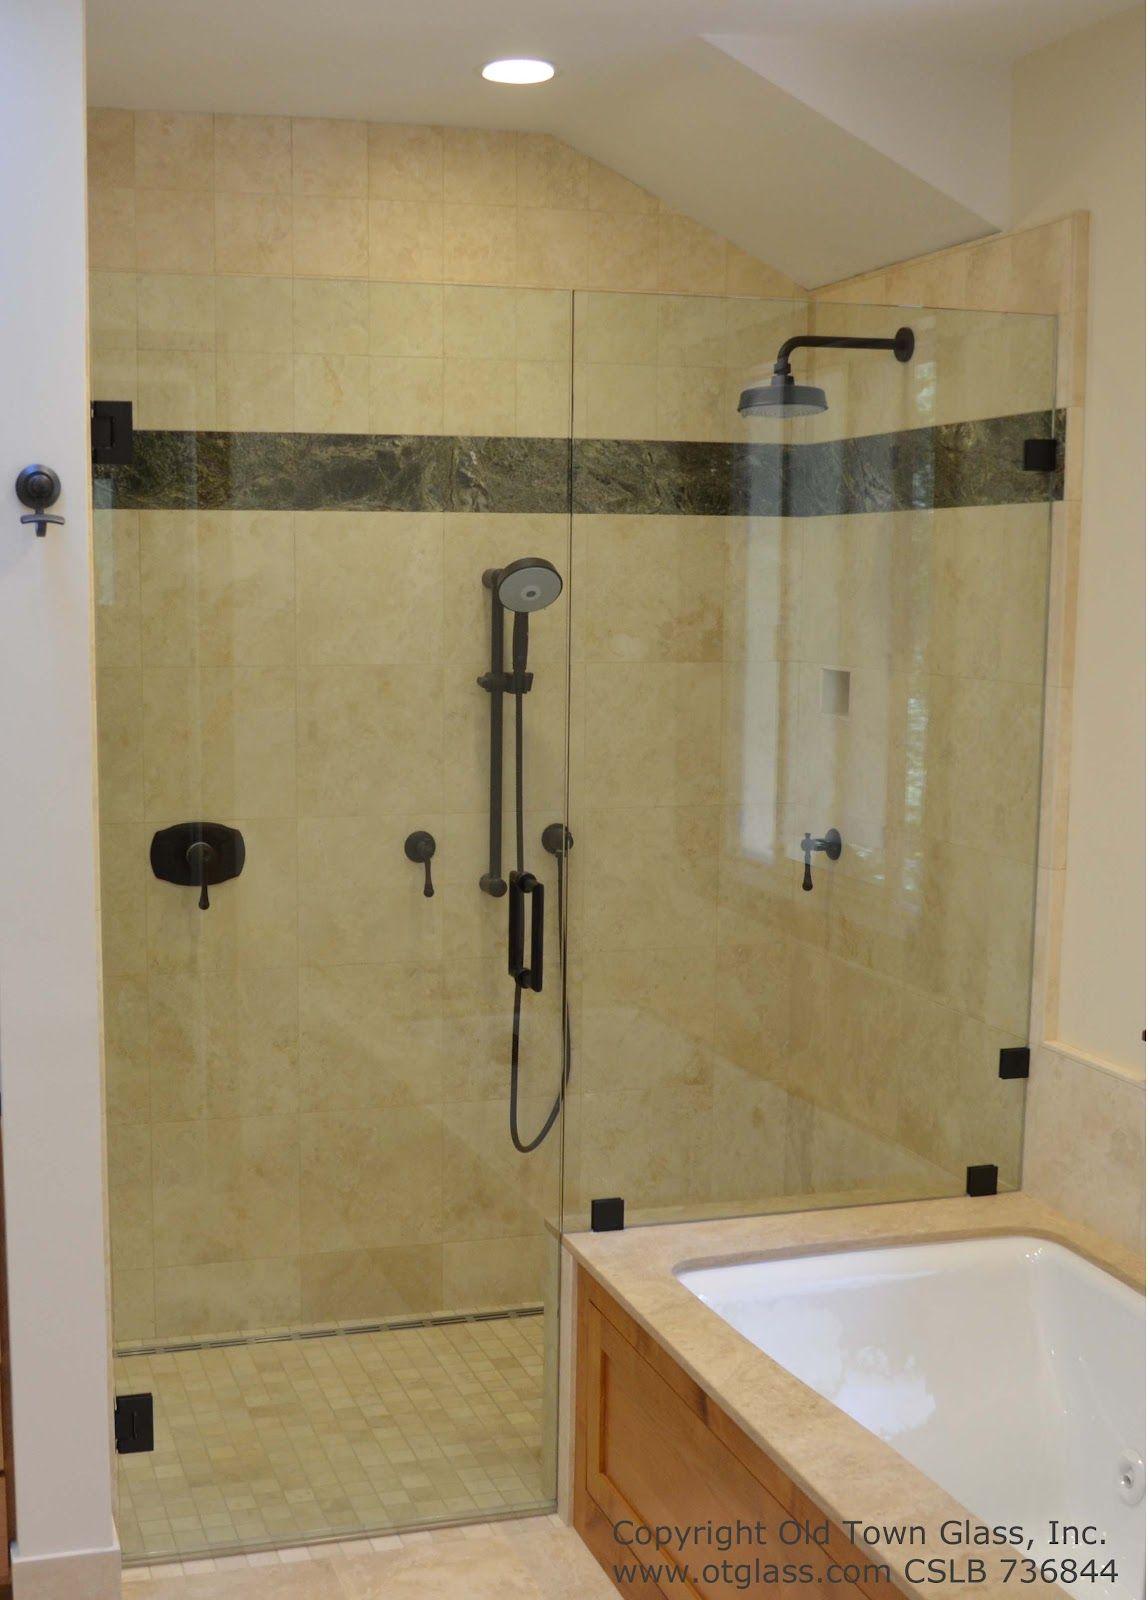 Replace Shower Door Bottom Sweep With Framed Shower Door Drip Rail Built With Thickest Aluminum Easily Attaches Framed Shower Door Framed Shower Shower Doors